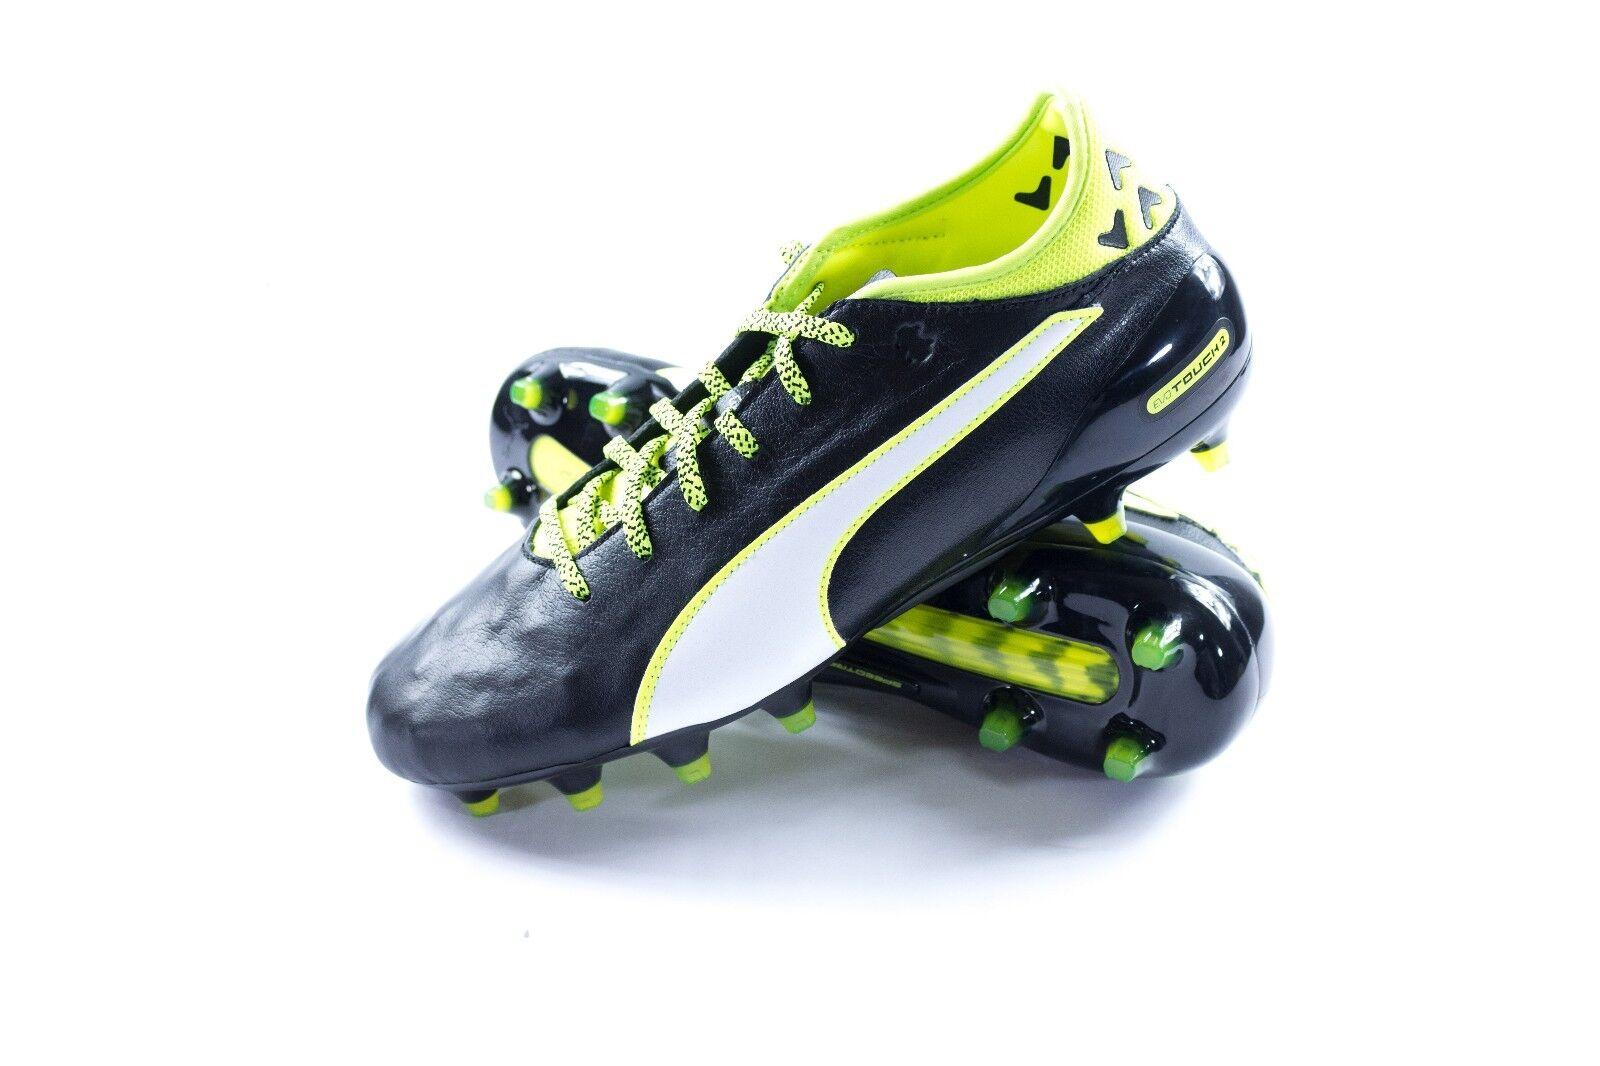 Puma Evotouch 2 Fg Mens Black Green Leather Athletic Lace Up Soccer Shoes Sz. 11 Cheap women's shoes women's shoes